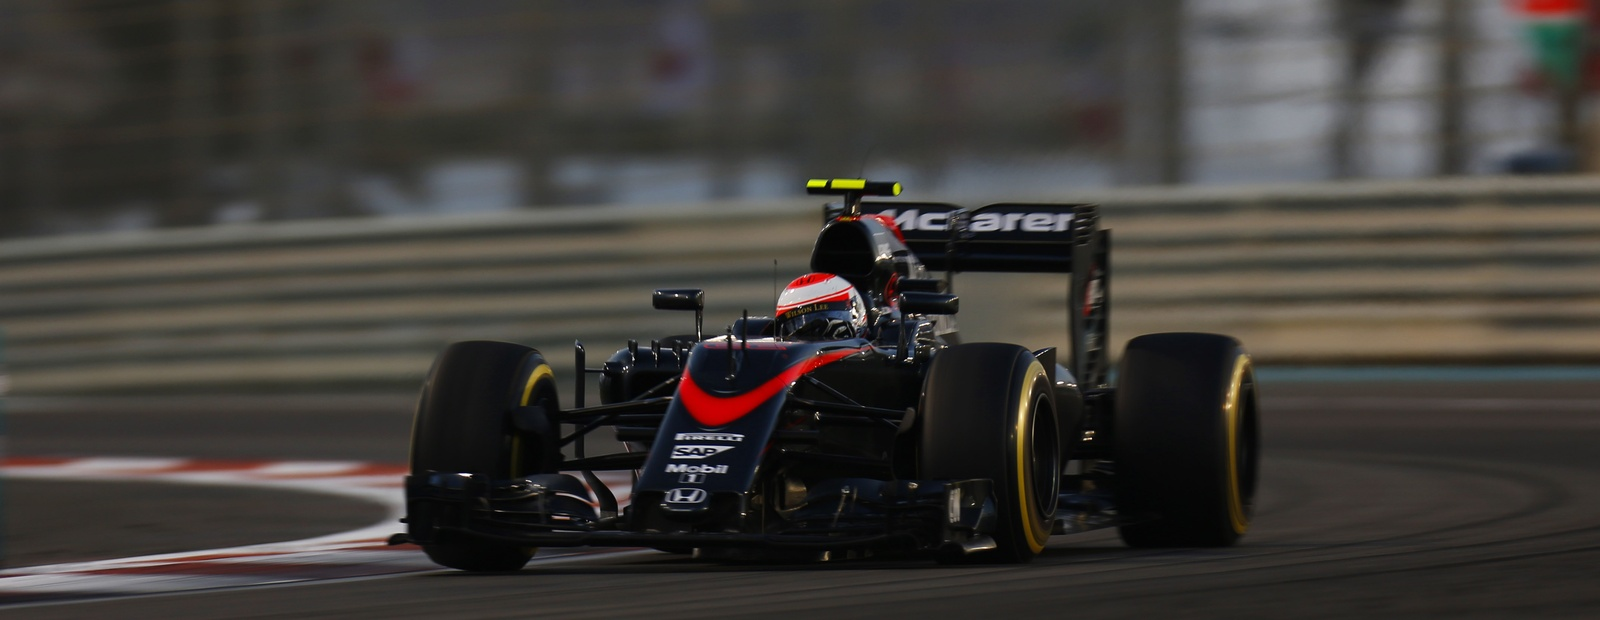 mclaren formula 1 - 2015 abu dhabi grand prix race report